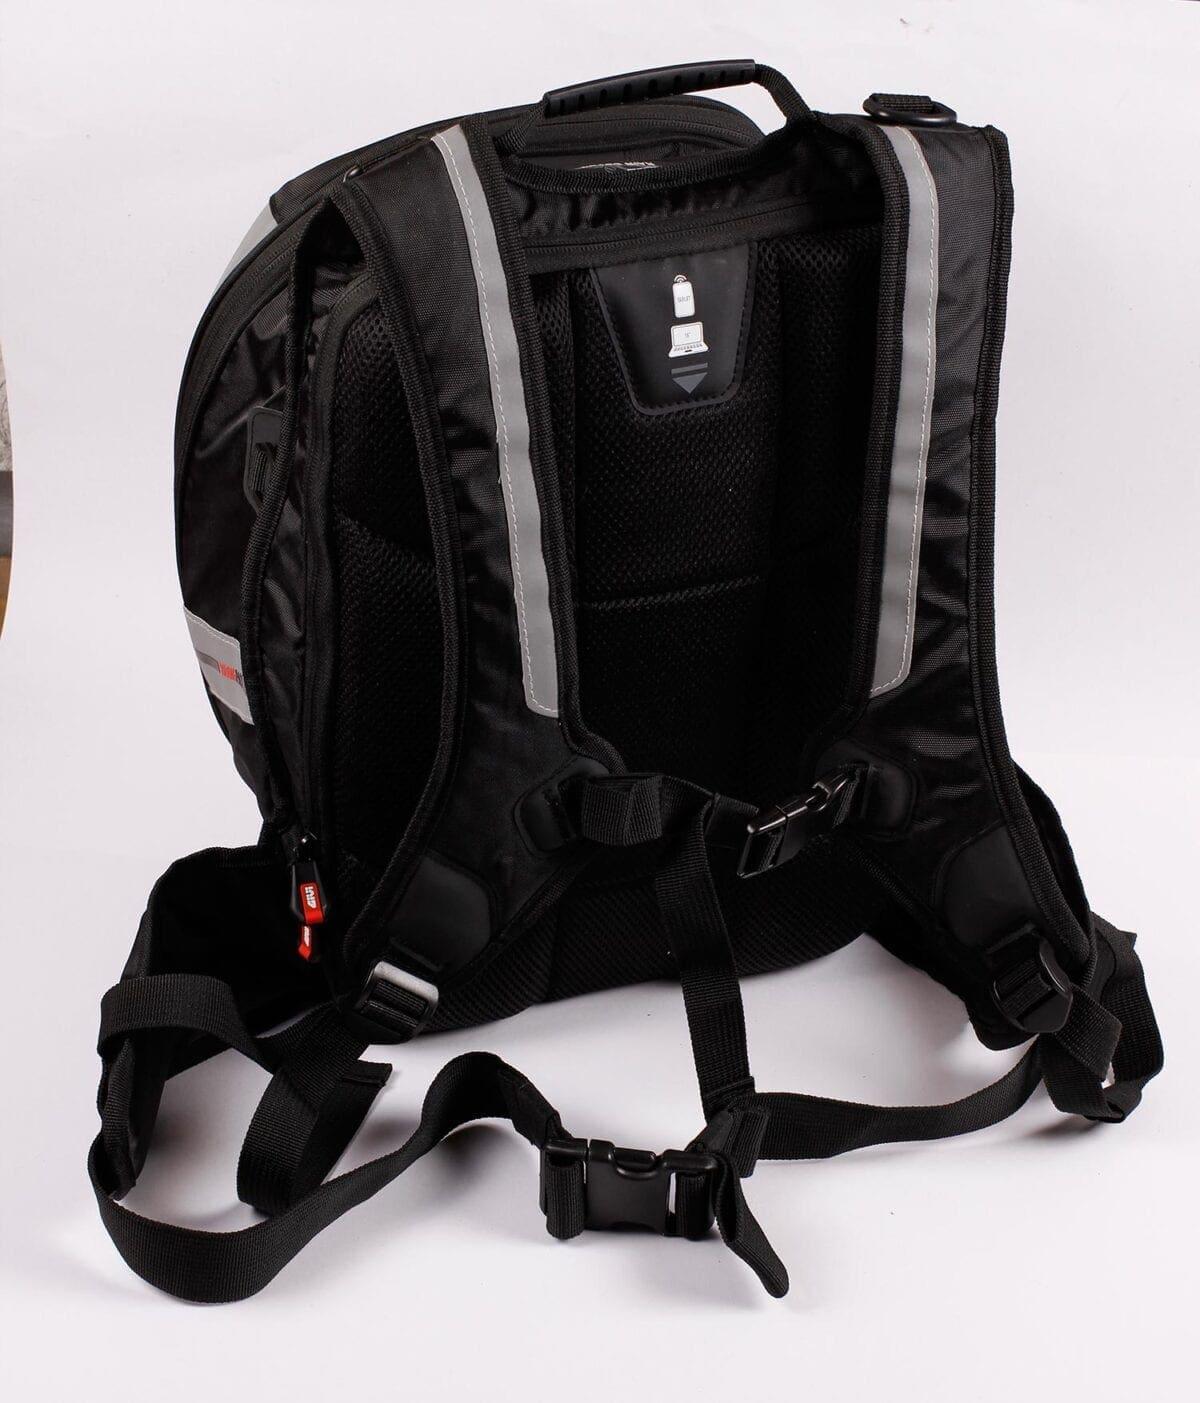 102_Bag-Detail-2